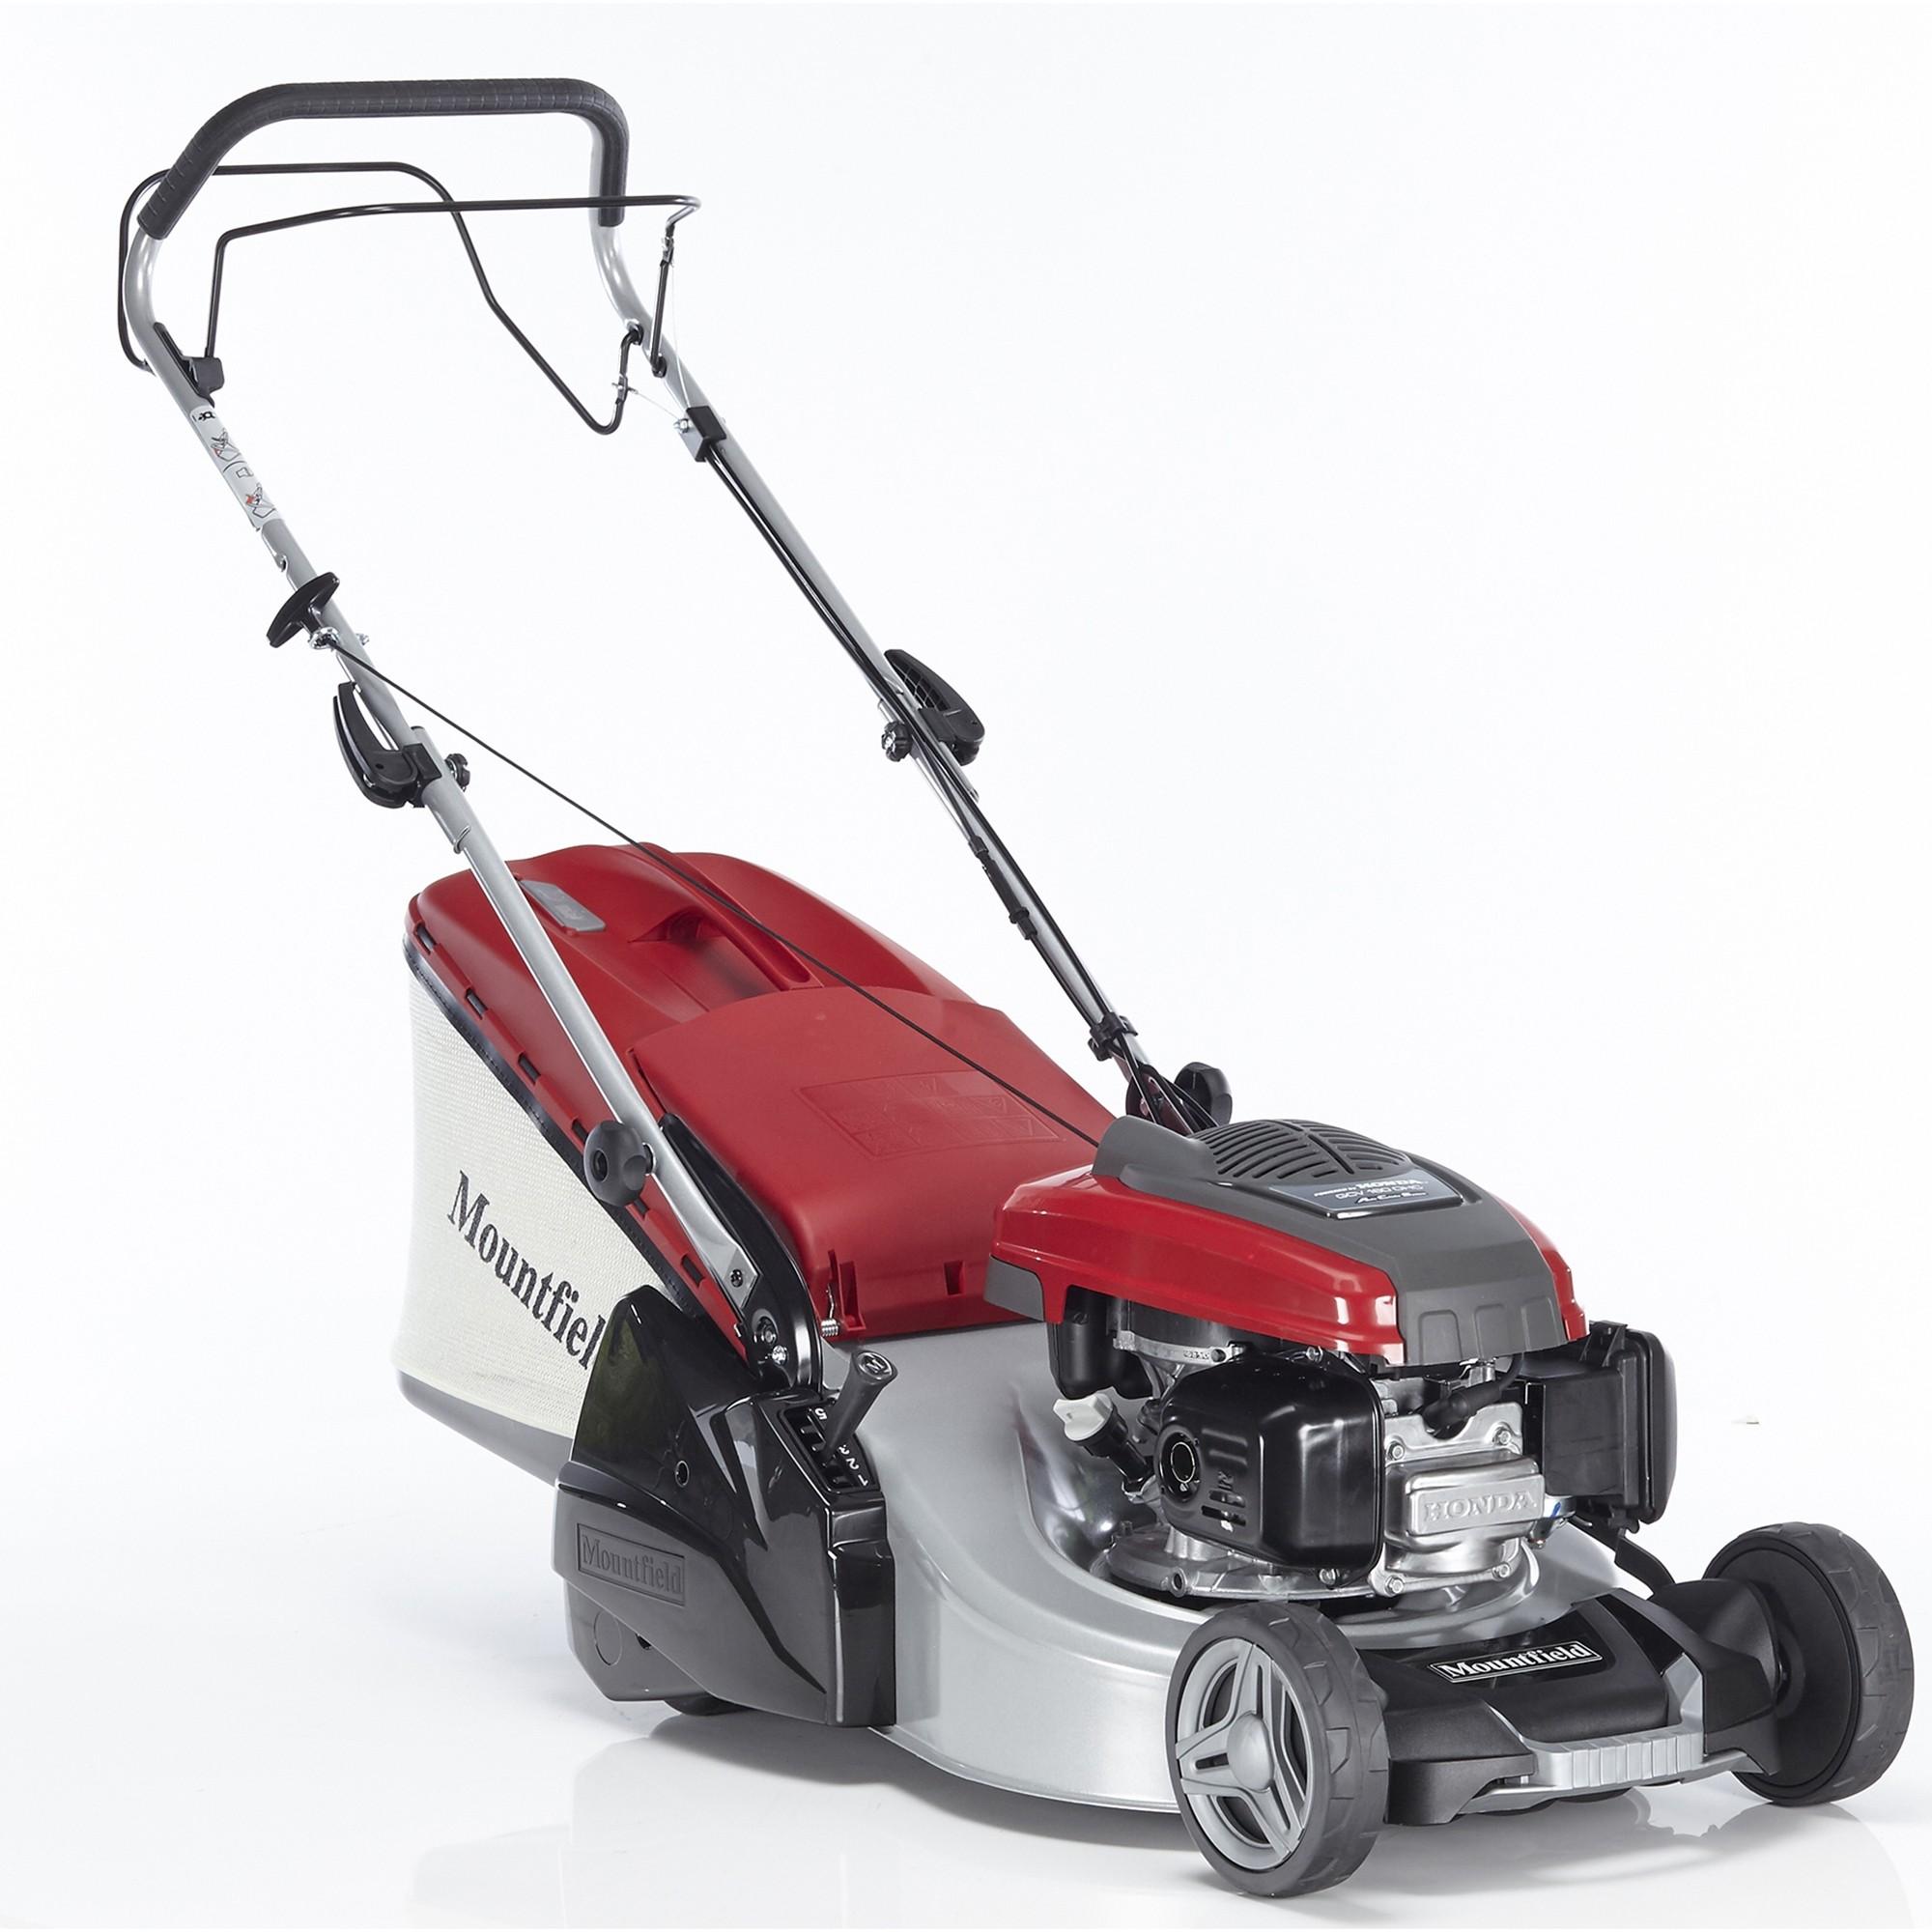 sp465r lawnmower